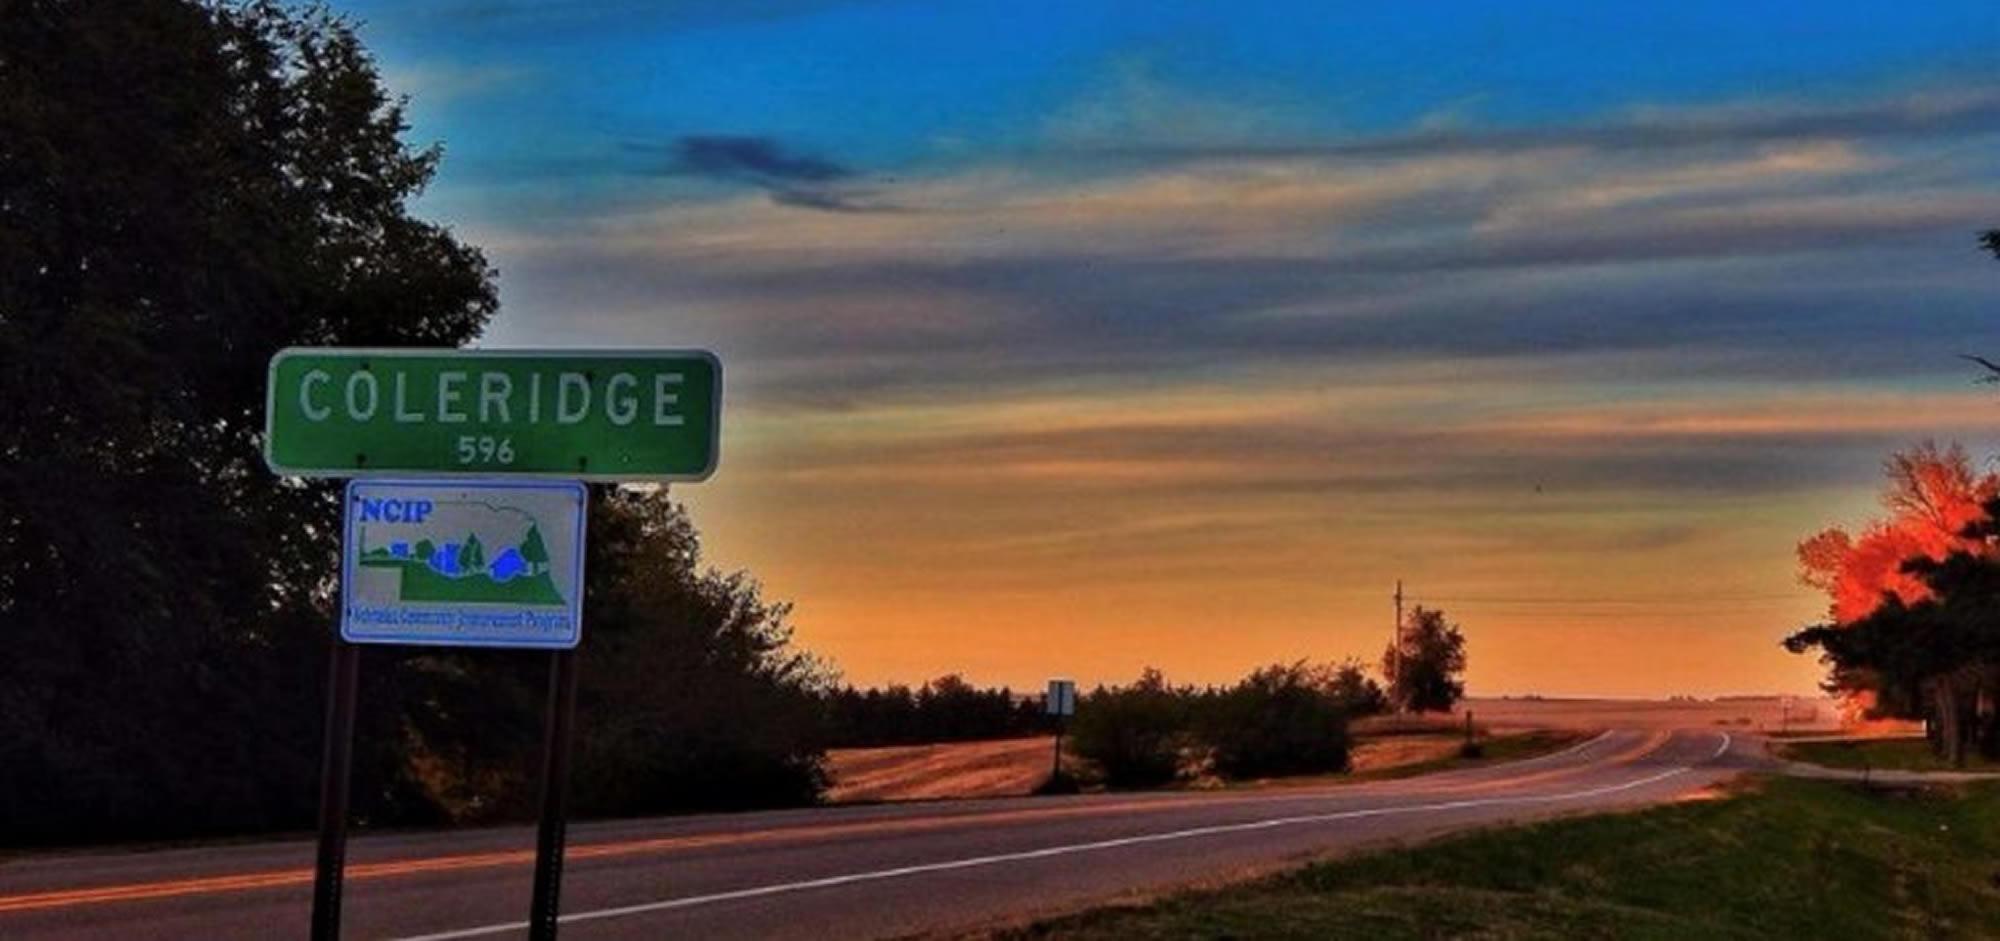 Coleridge Population Sign